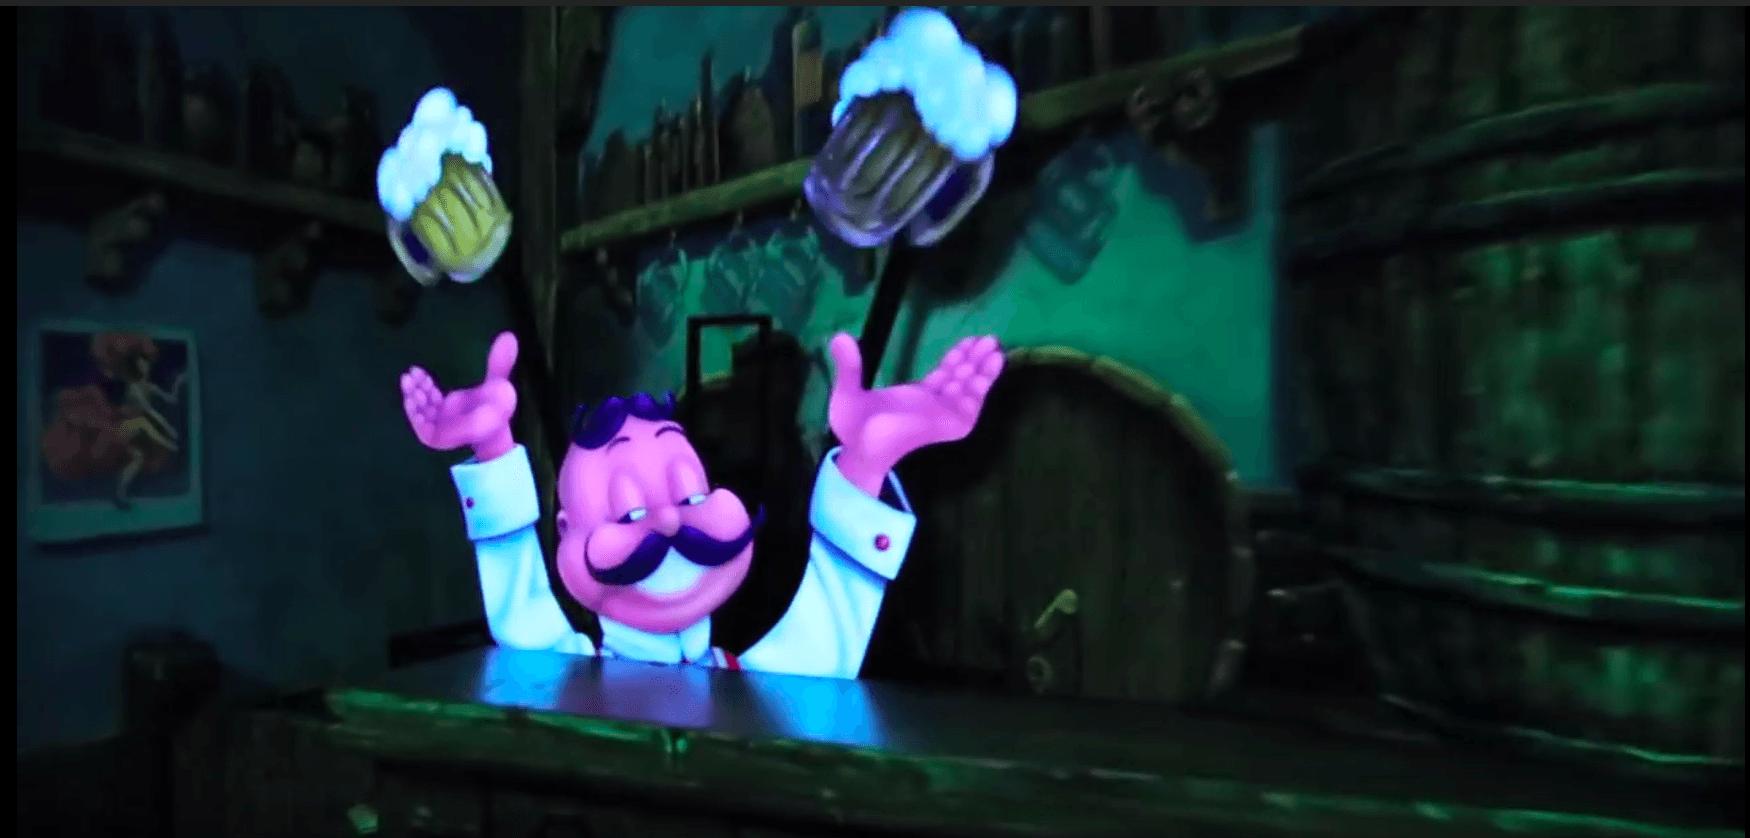 Mr. Toad's Wild Ride pub